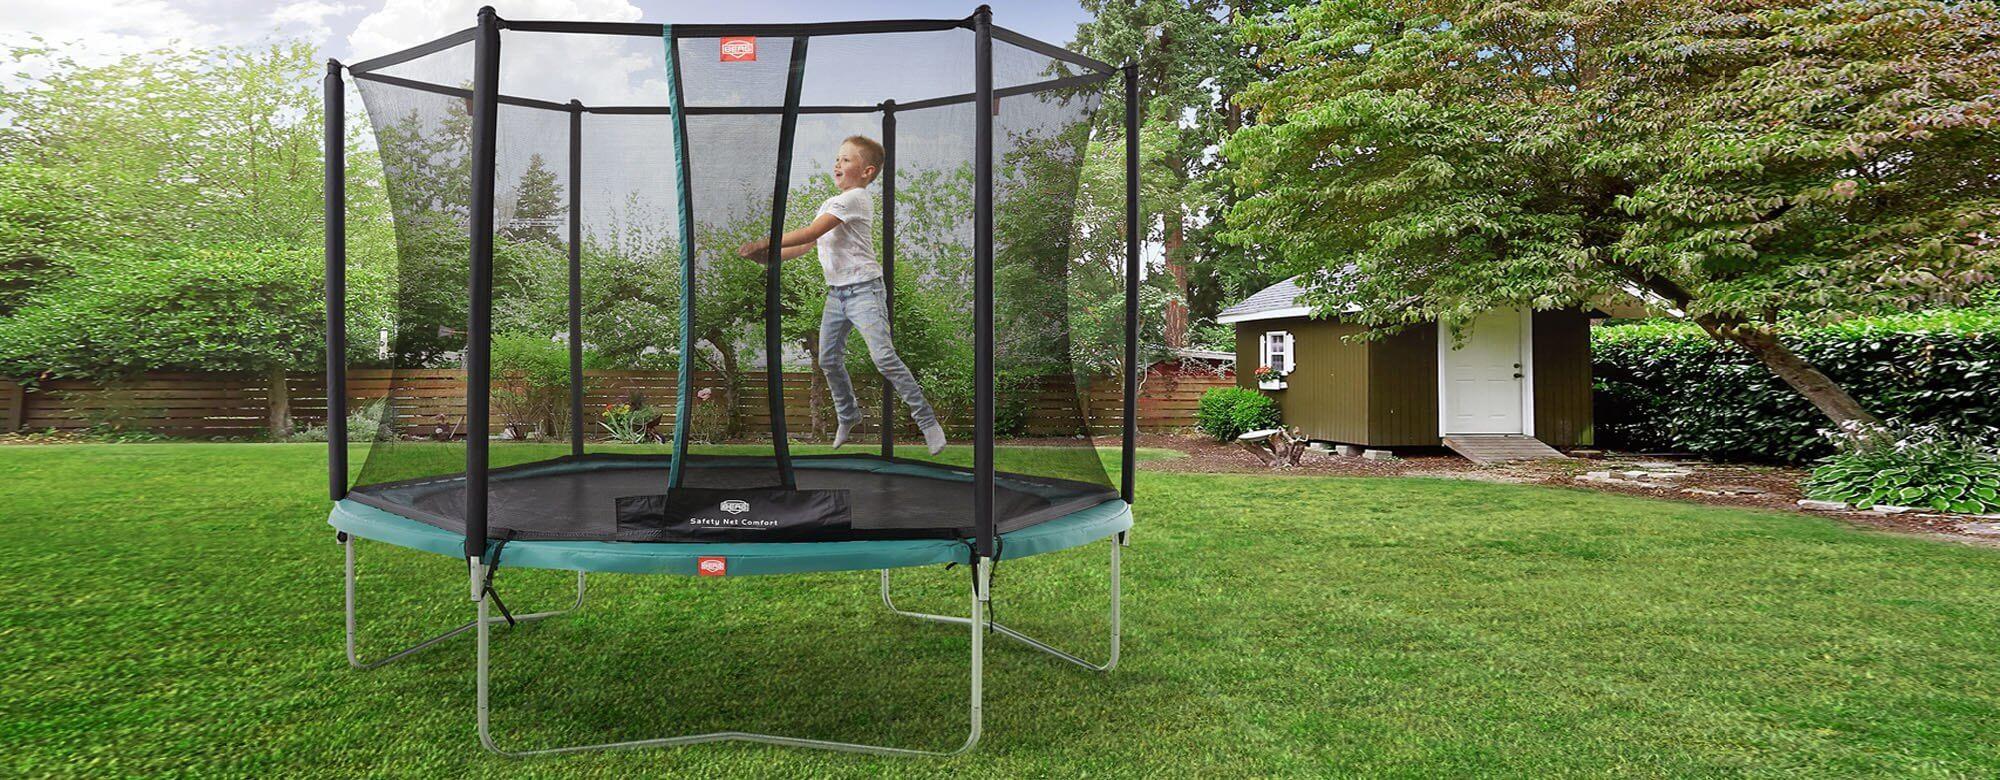 berg trampolin talent original berg trampolin so g nstig. Black Bedroom Furniture Sets. Home Design Ideas